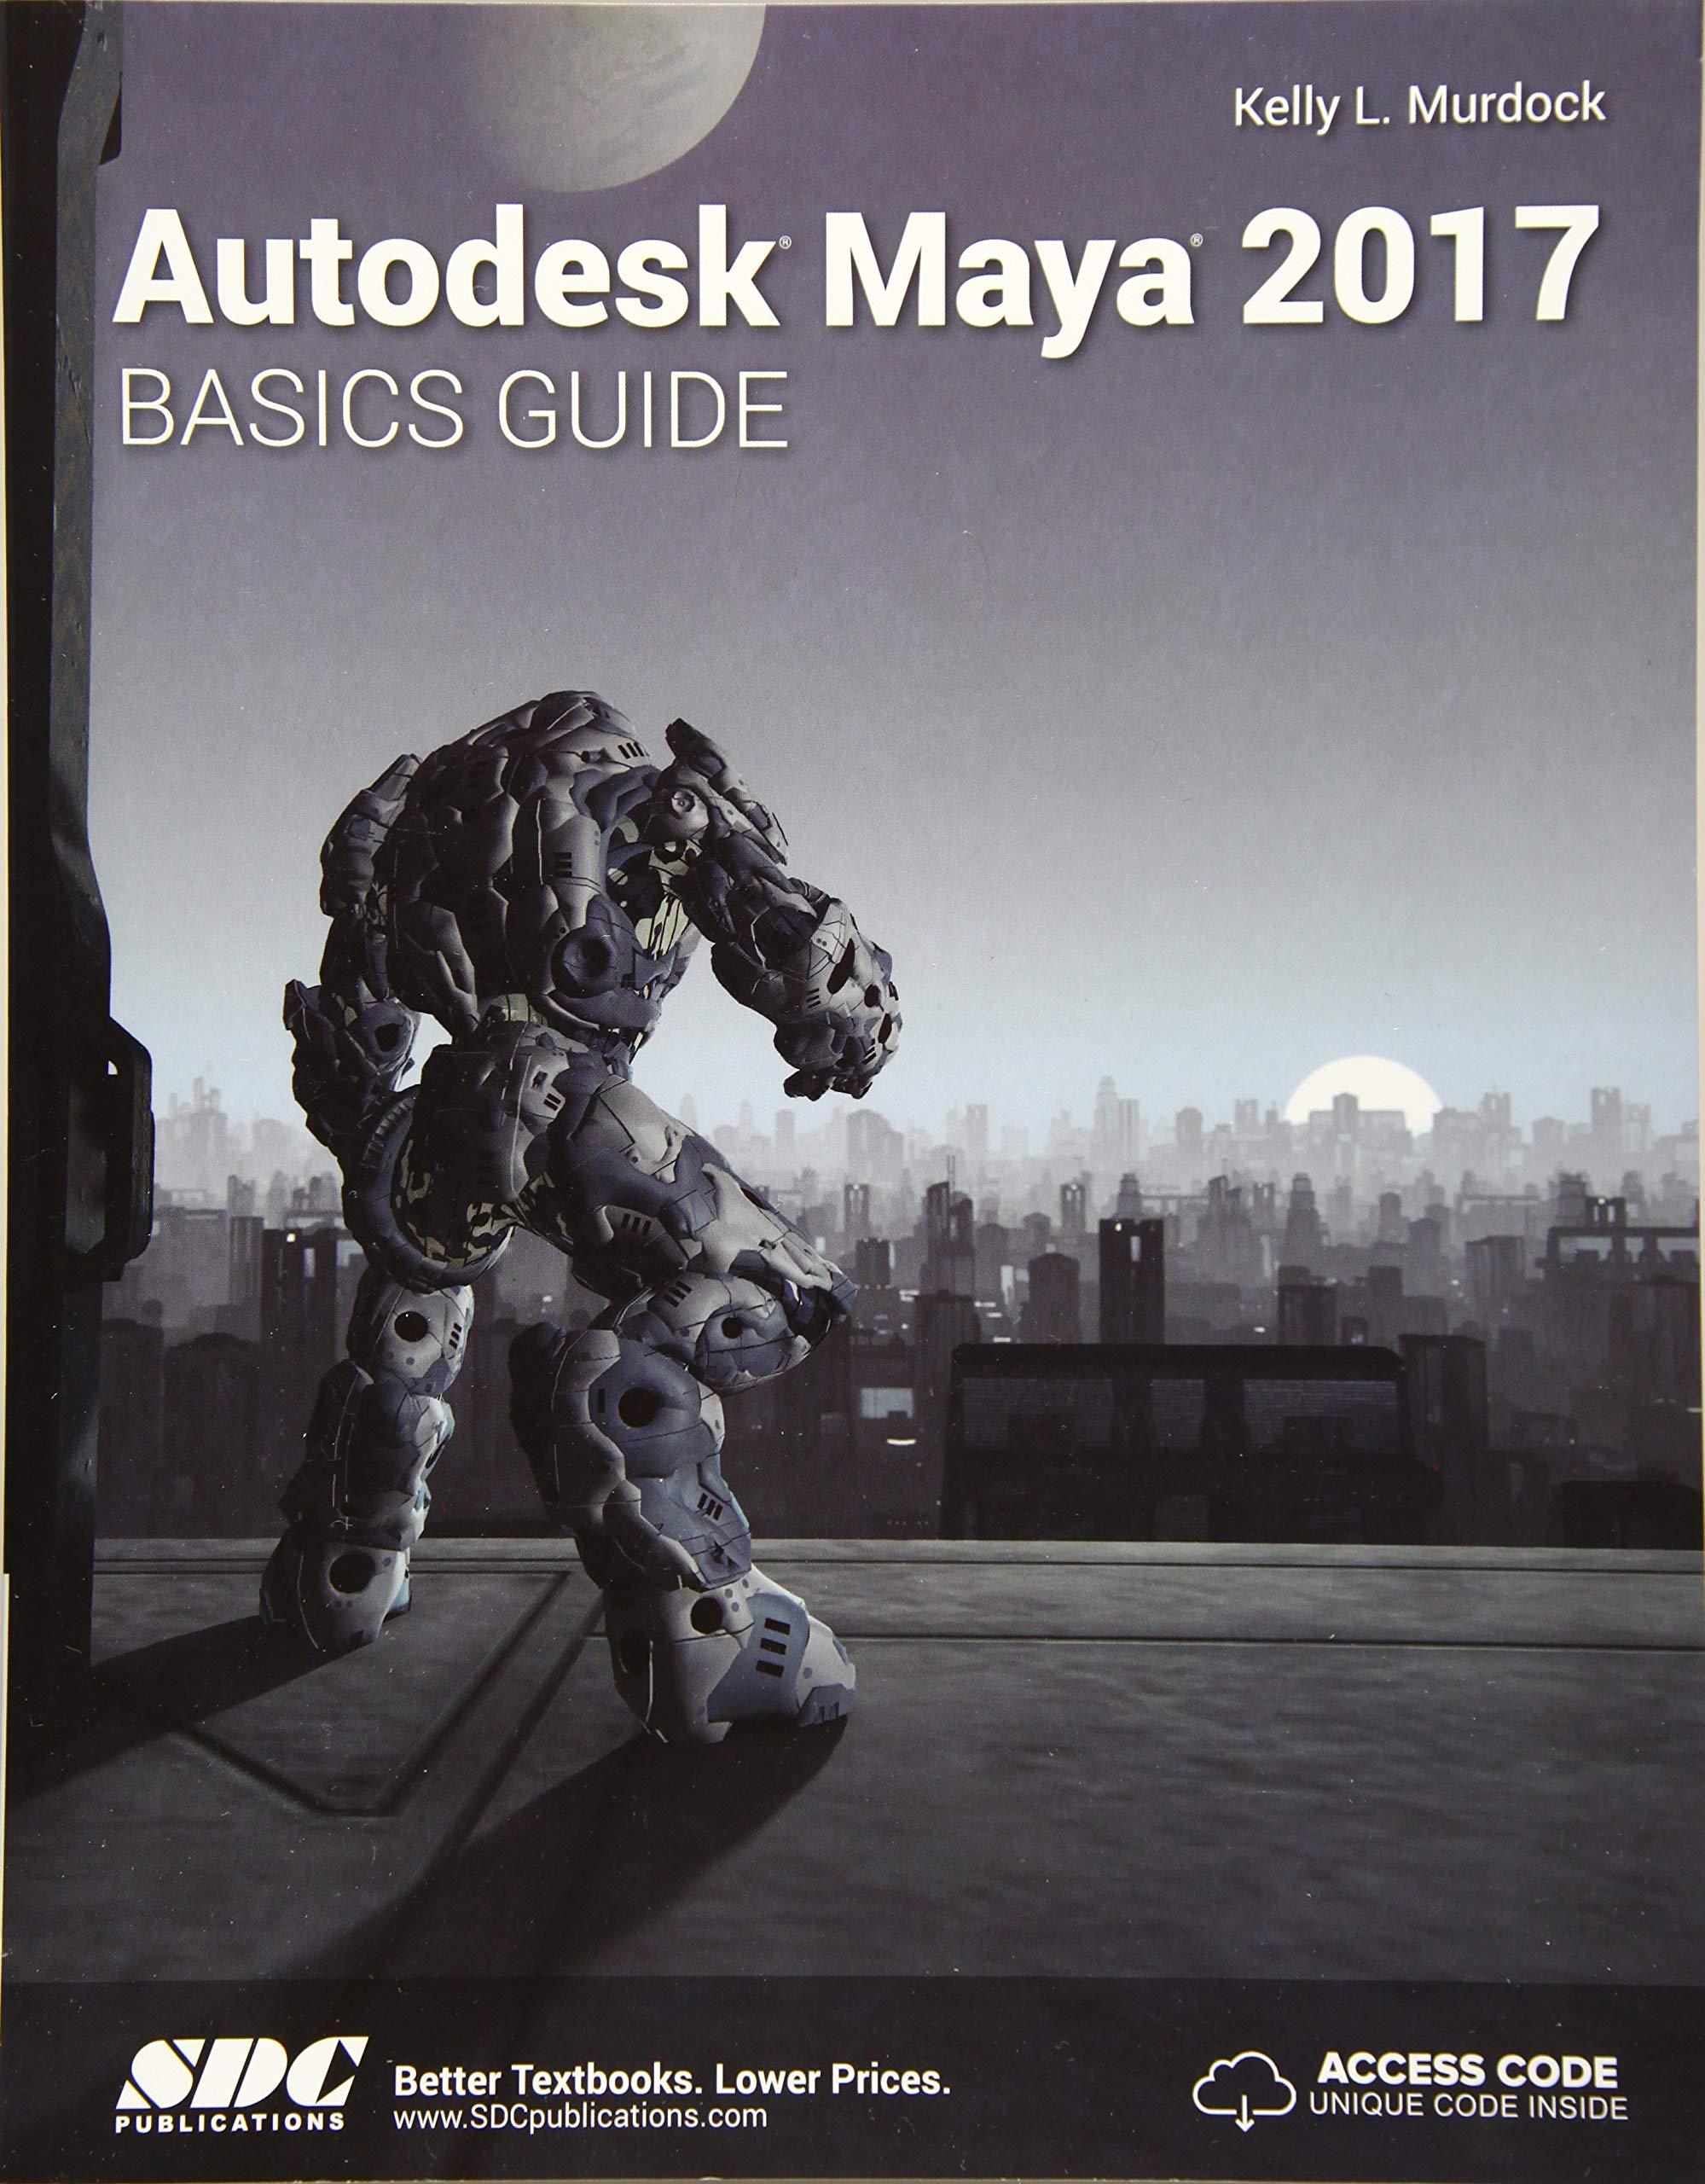 Autodesk Maya 2017 Basics Guide: Kelly L  Murdock